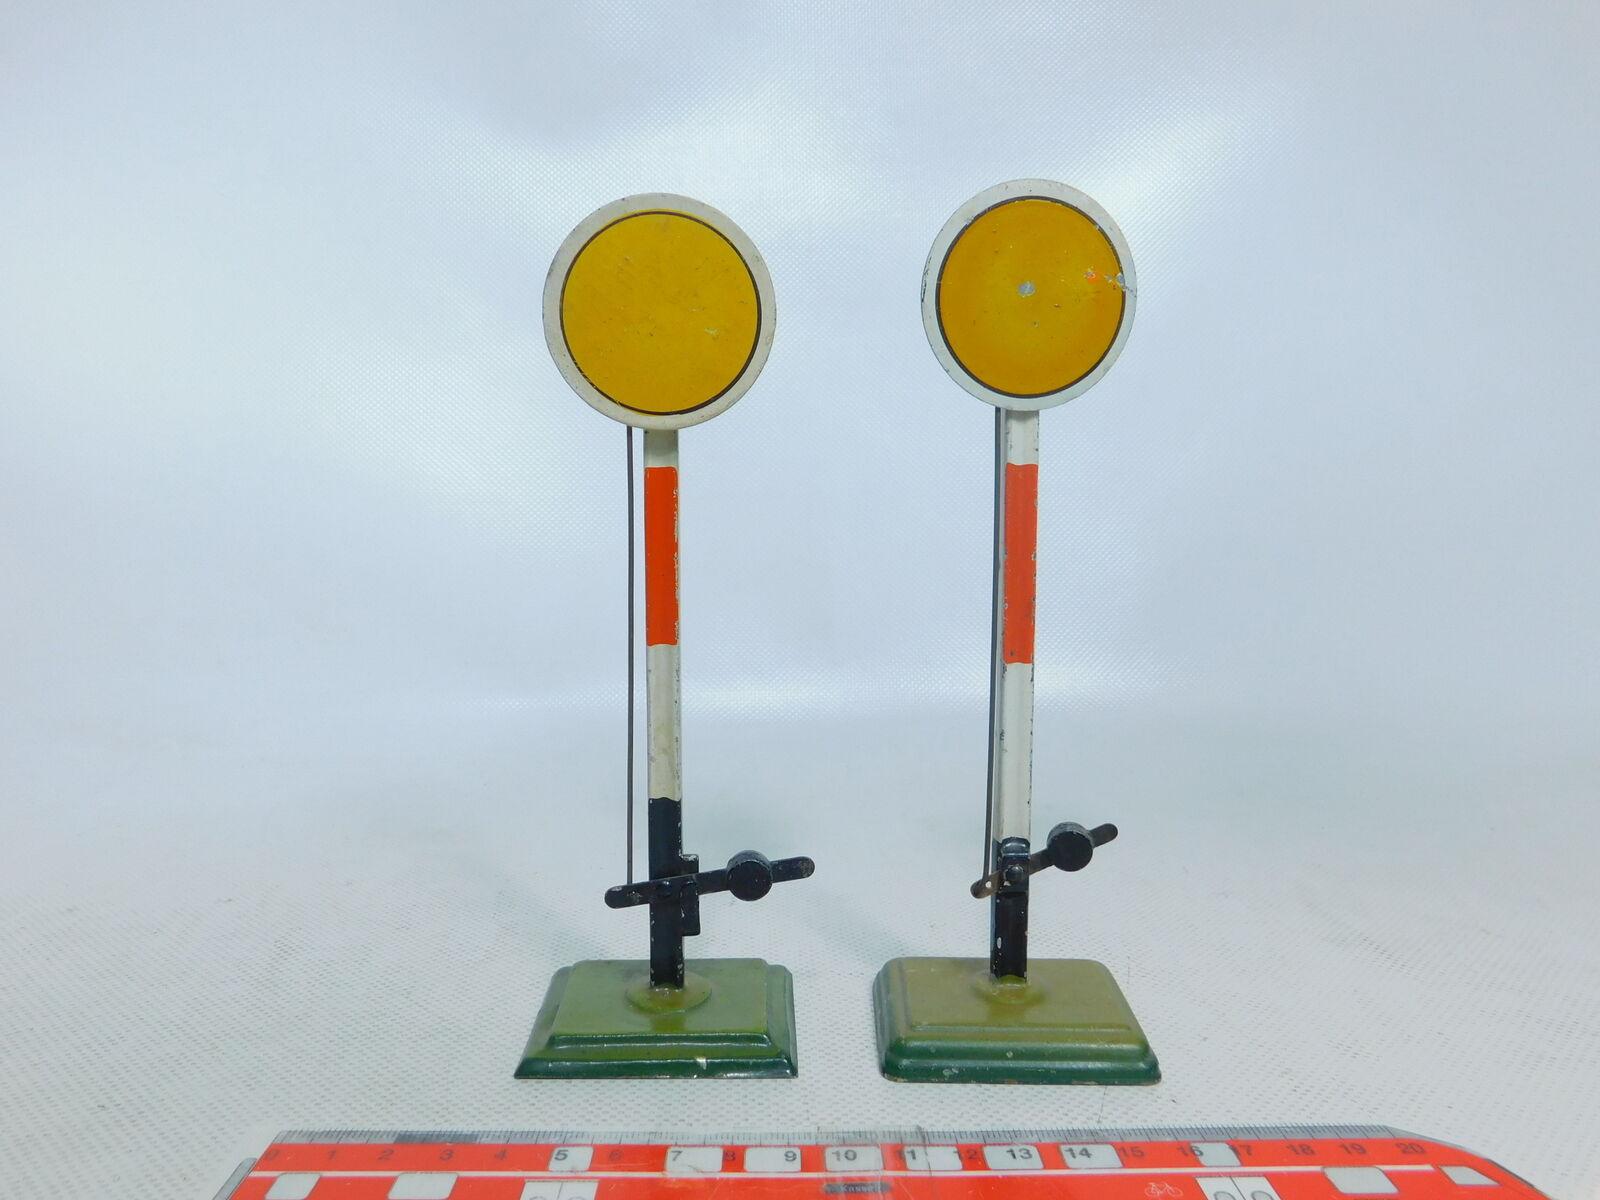 BY374-0,5  2x Märklin Spur 1 Vorsignal Signal Handsignal (Höhe ca. 17,7 cm)